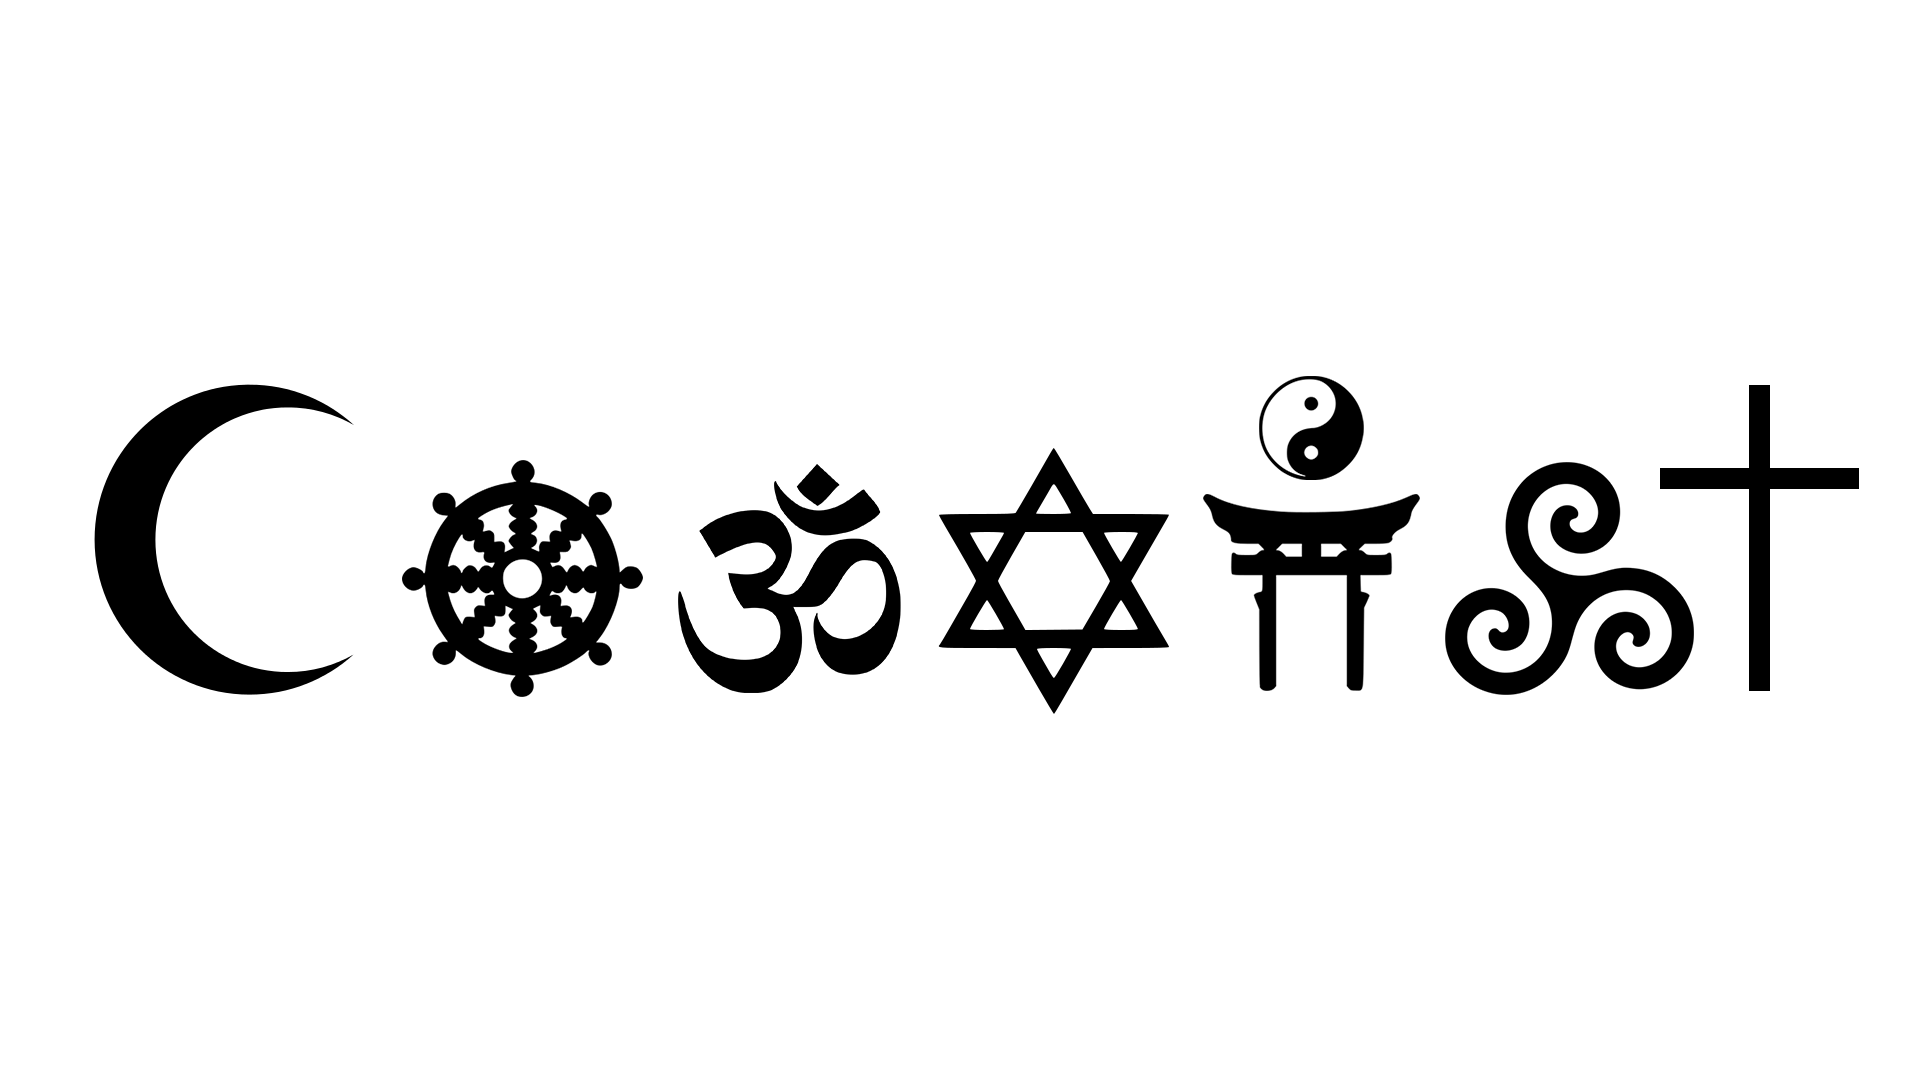 FileCoexist Tattoo Transparent 1080p.png , Wikimedia Commons